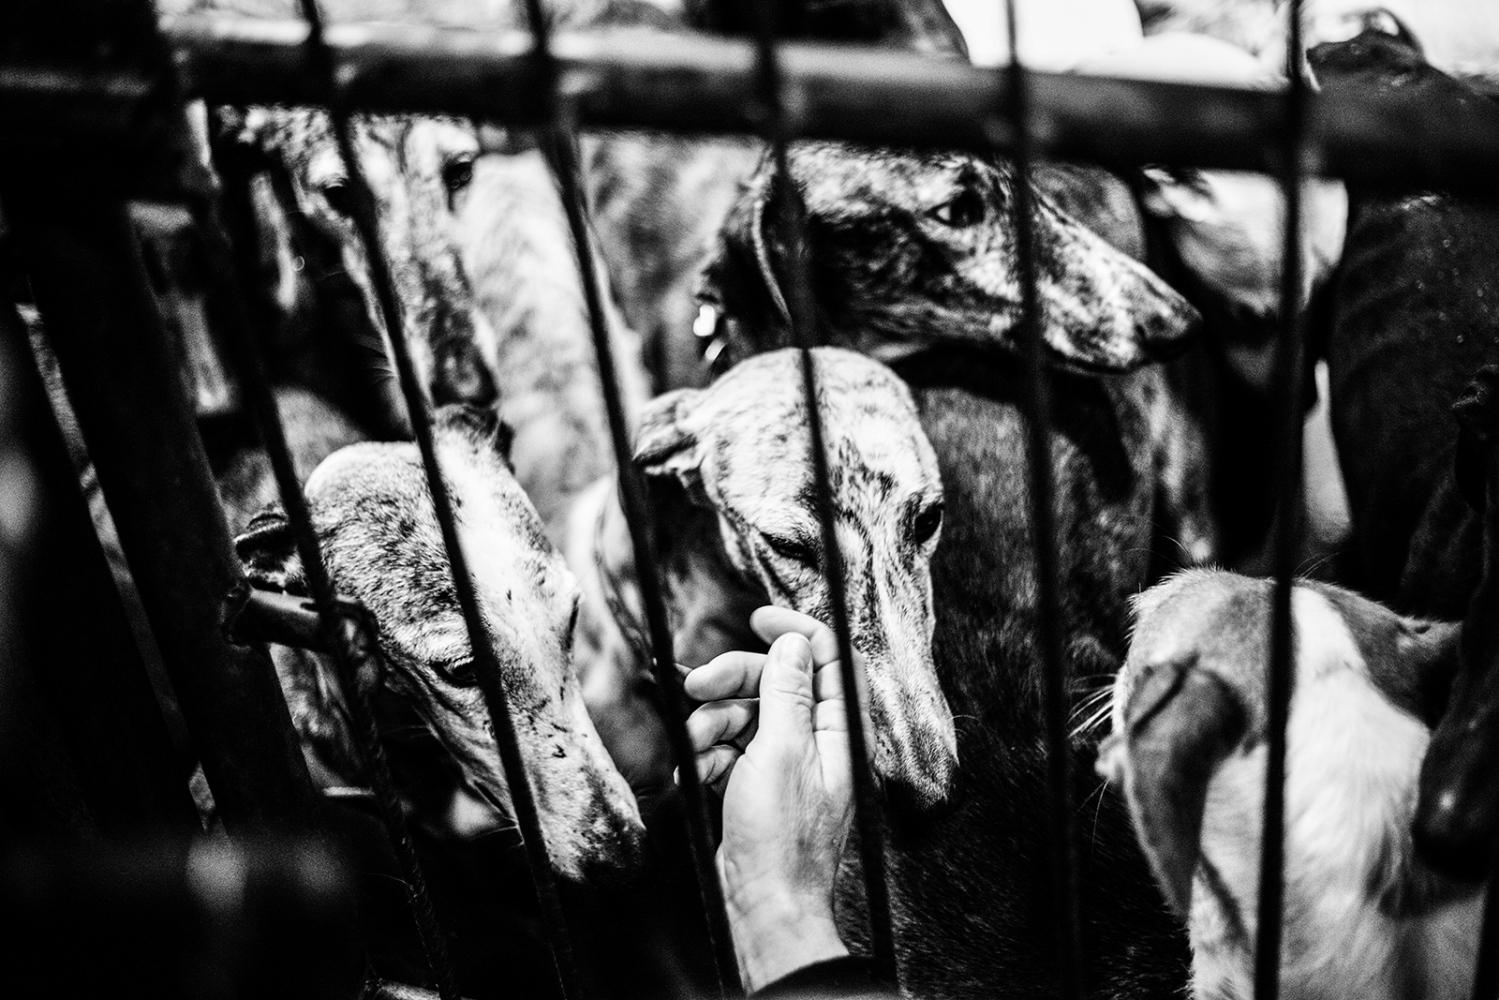 Art and Documentary Photography - Loading Scars_david_arribas.jpg